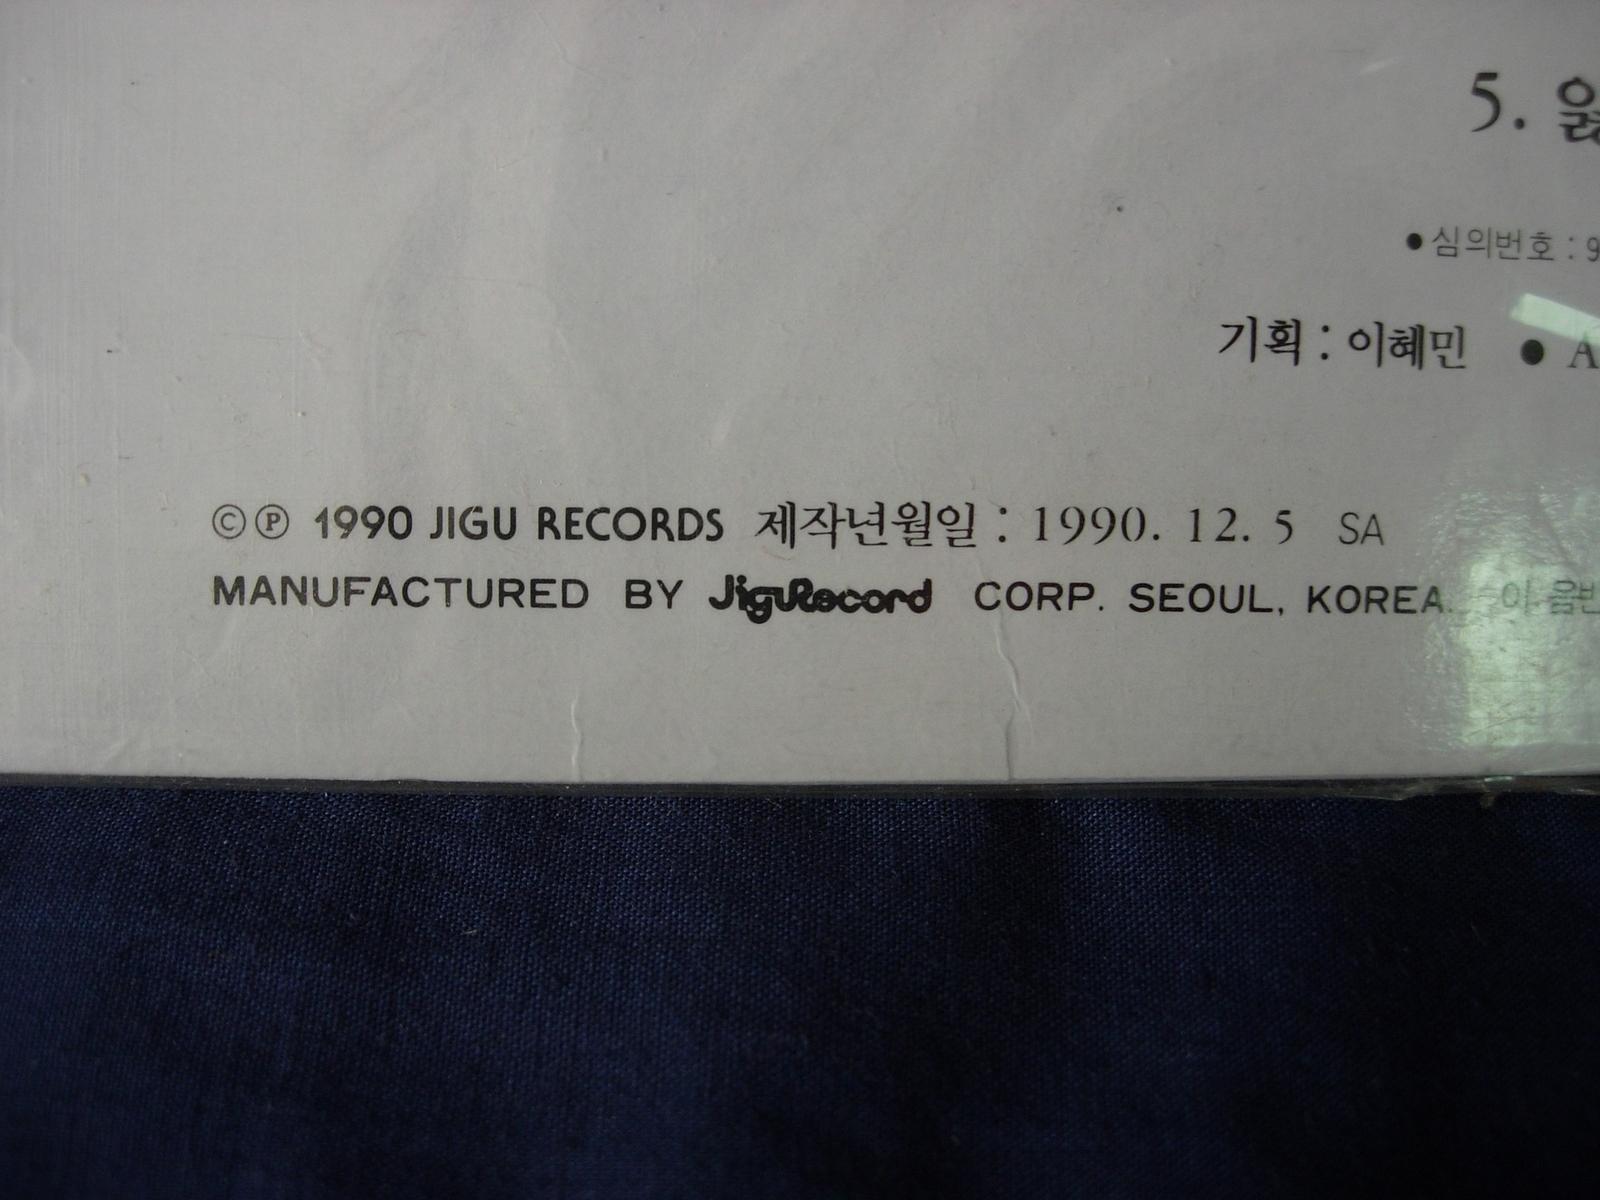 Kim Jae-hee re-[huy] - KOREAN RECORD - JIGU Records JLS-1202379 SEALED